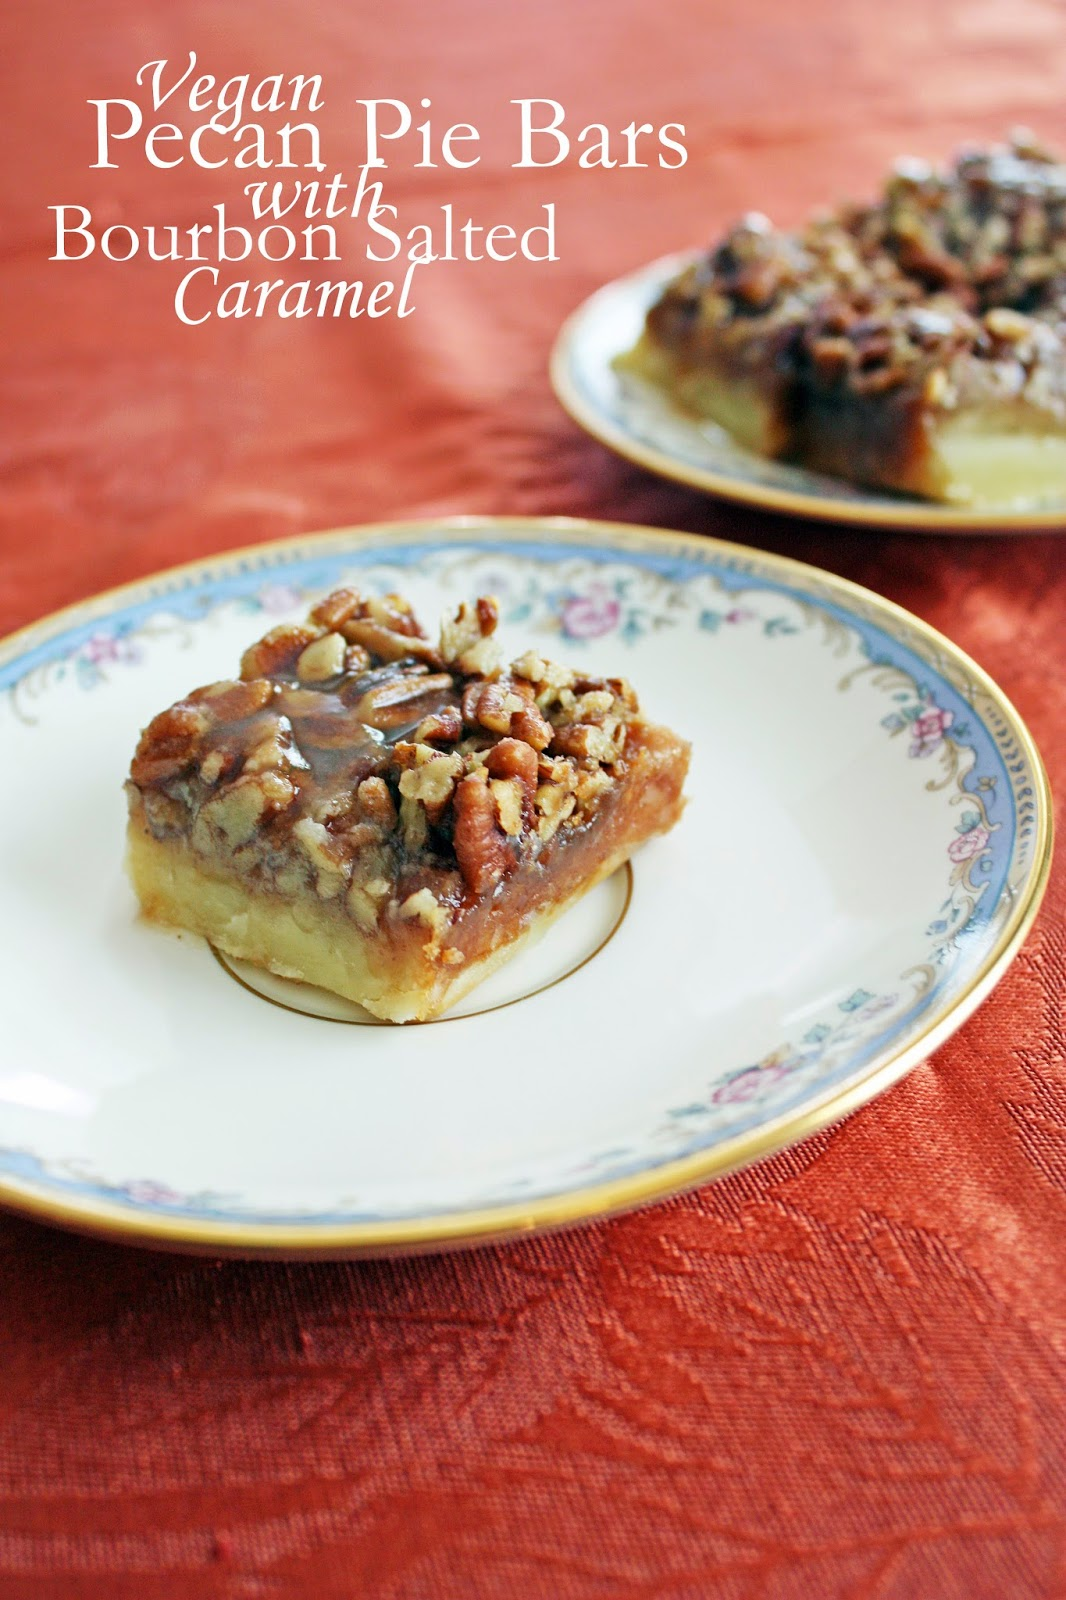 salty sweet pecan pie bars with bourbon caramel sauce